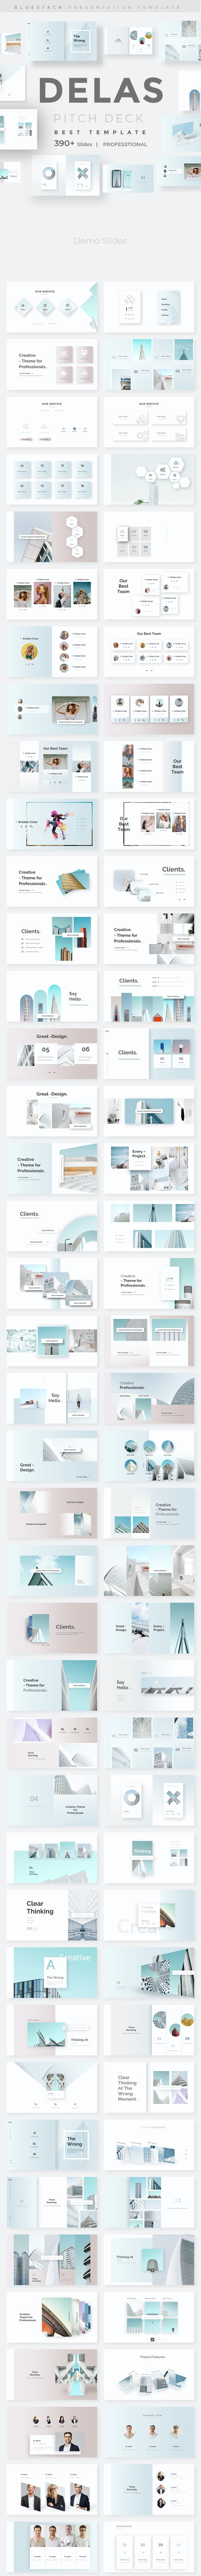 Delas Minimal Design Keynote Template - Creative Keynote Templates